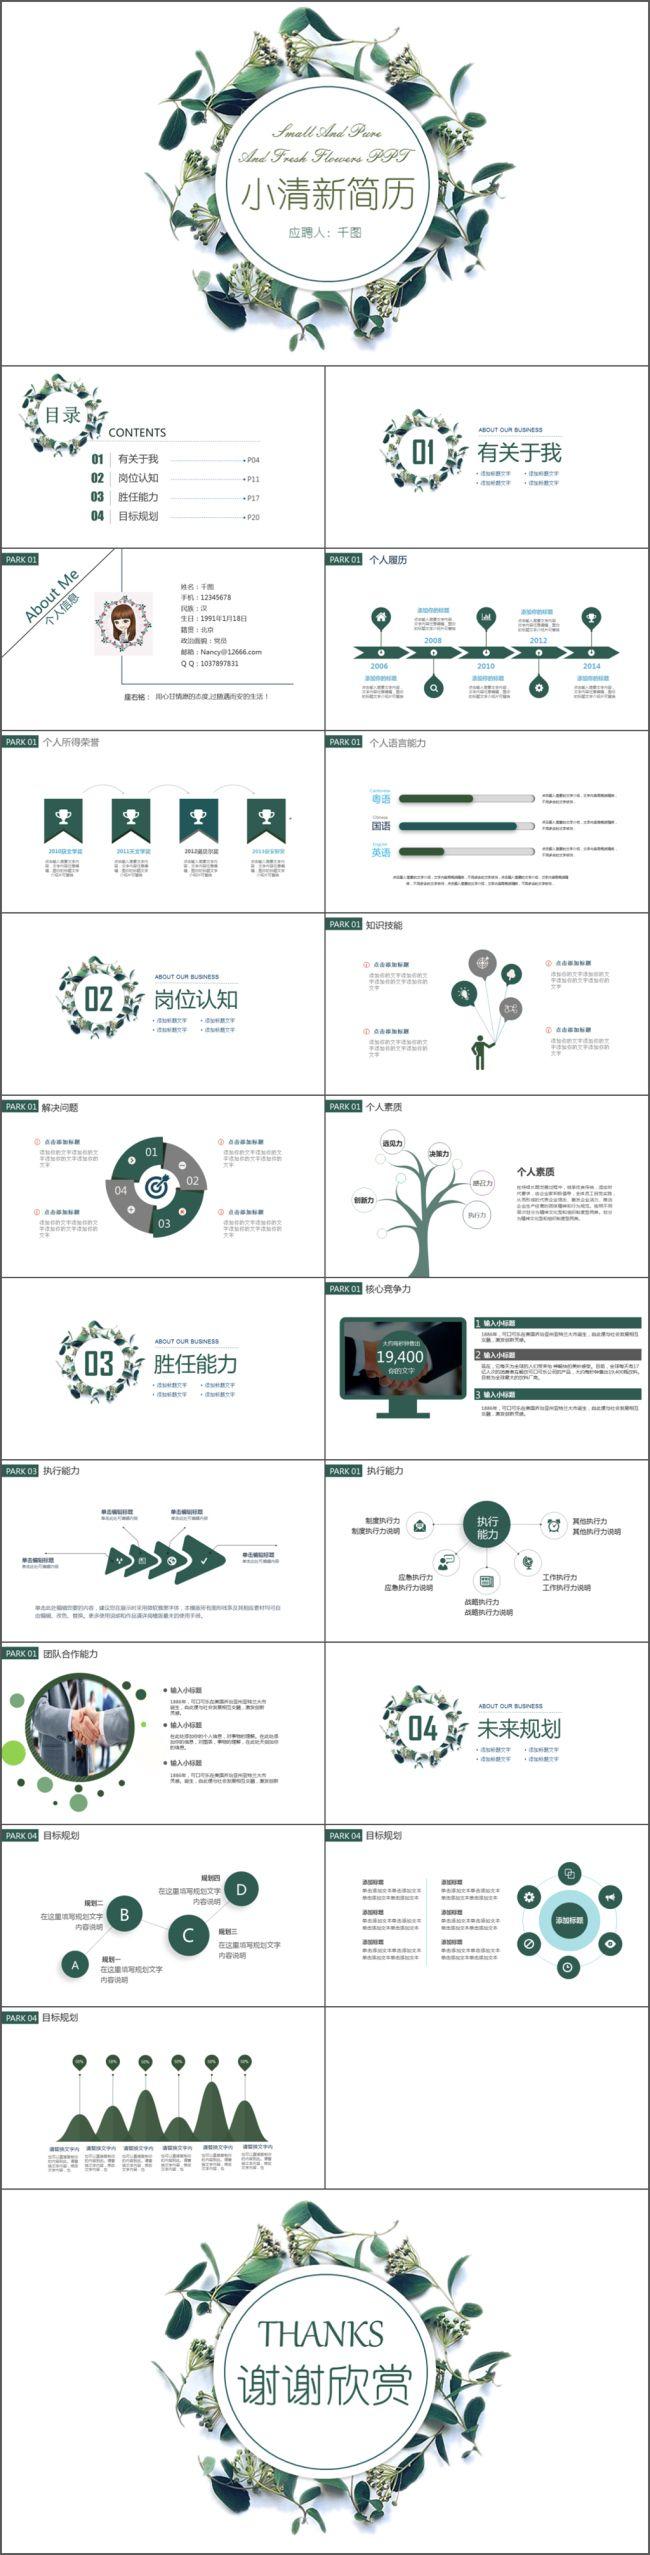 2017 fresh elegant korean garland resume competition for animation 2017 fresh elegant korean garland resume competition for animation ppt templates download for free on heypik power point templates for free use toneelgroepblik Images